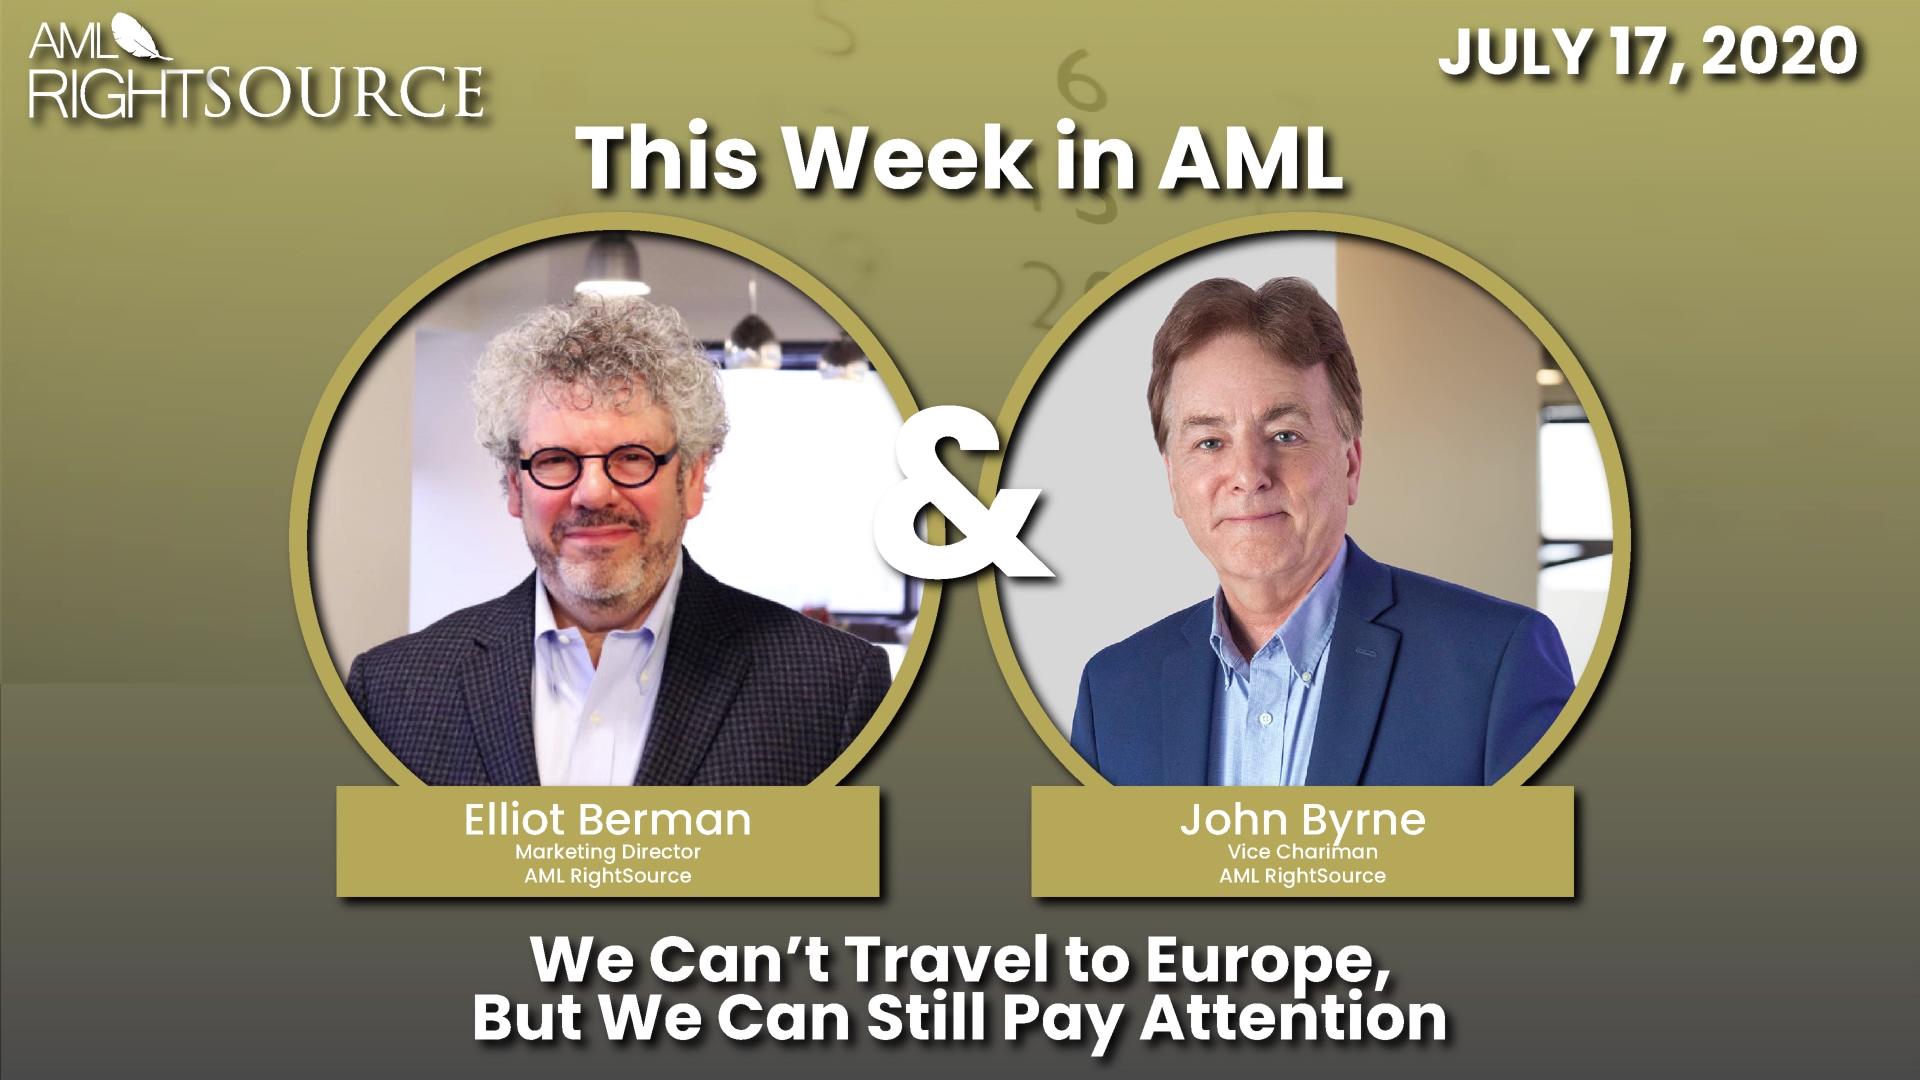 This_Week_In_AML_July_17_2020